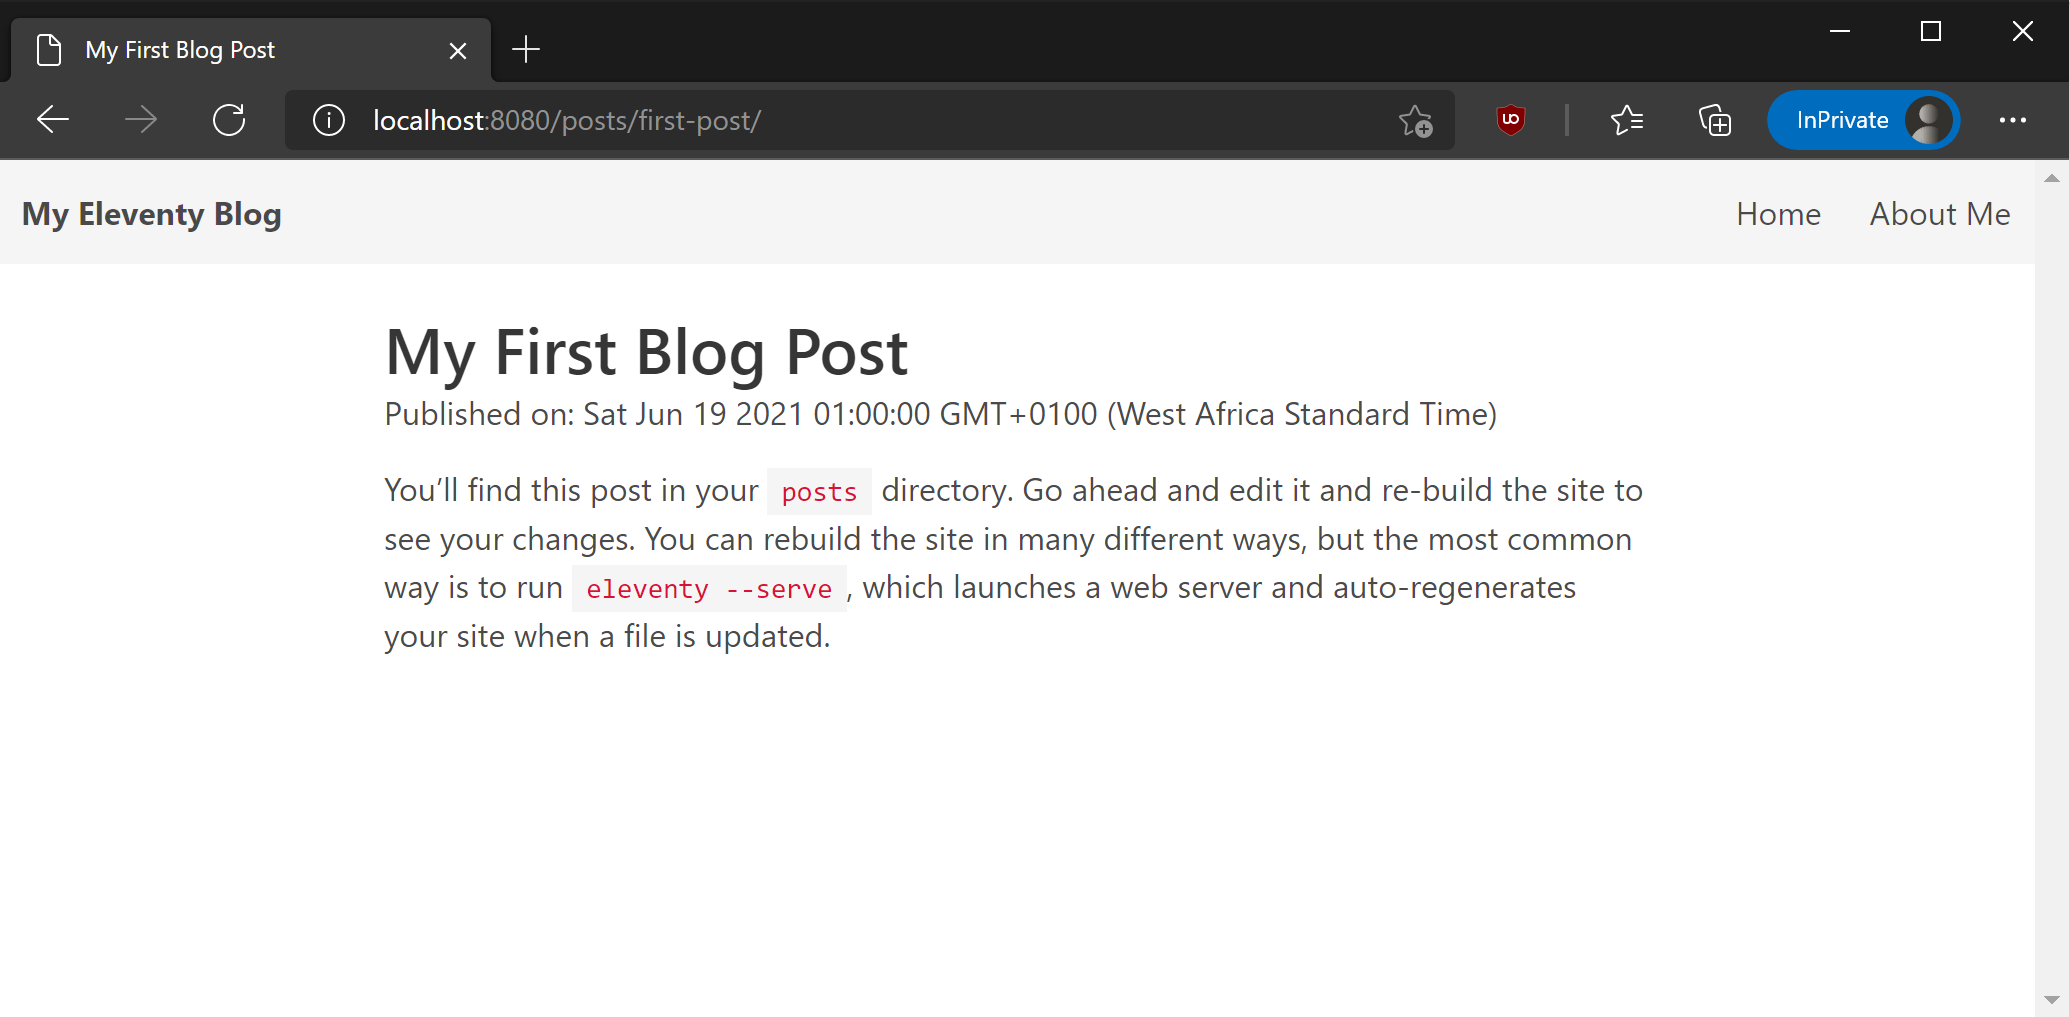 A blog post